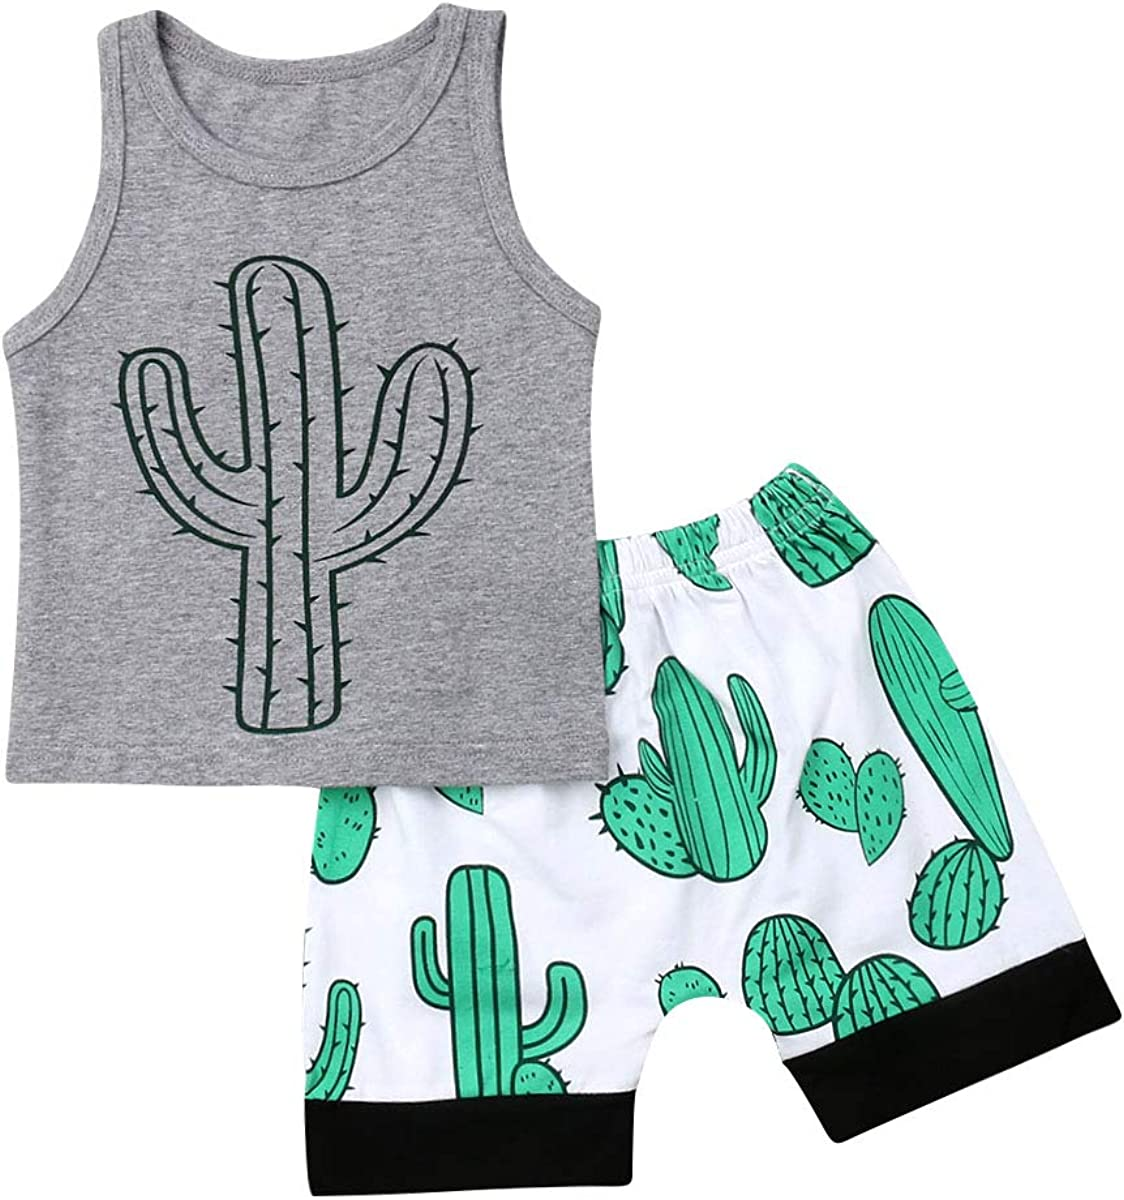 40% OFF Cheap Sale Baby Boy 2021 Summer Clothes Beach Vest + Set Pa Tank Sleeveless Tops